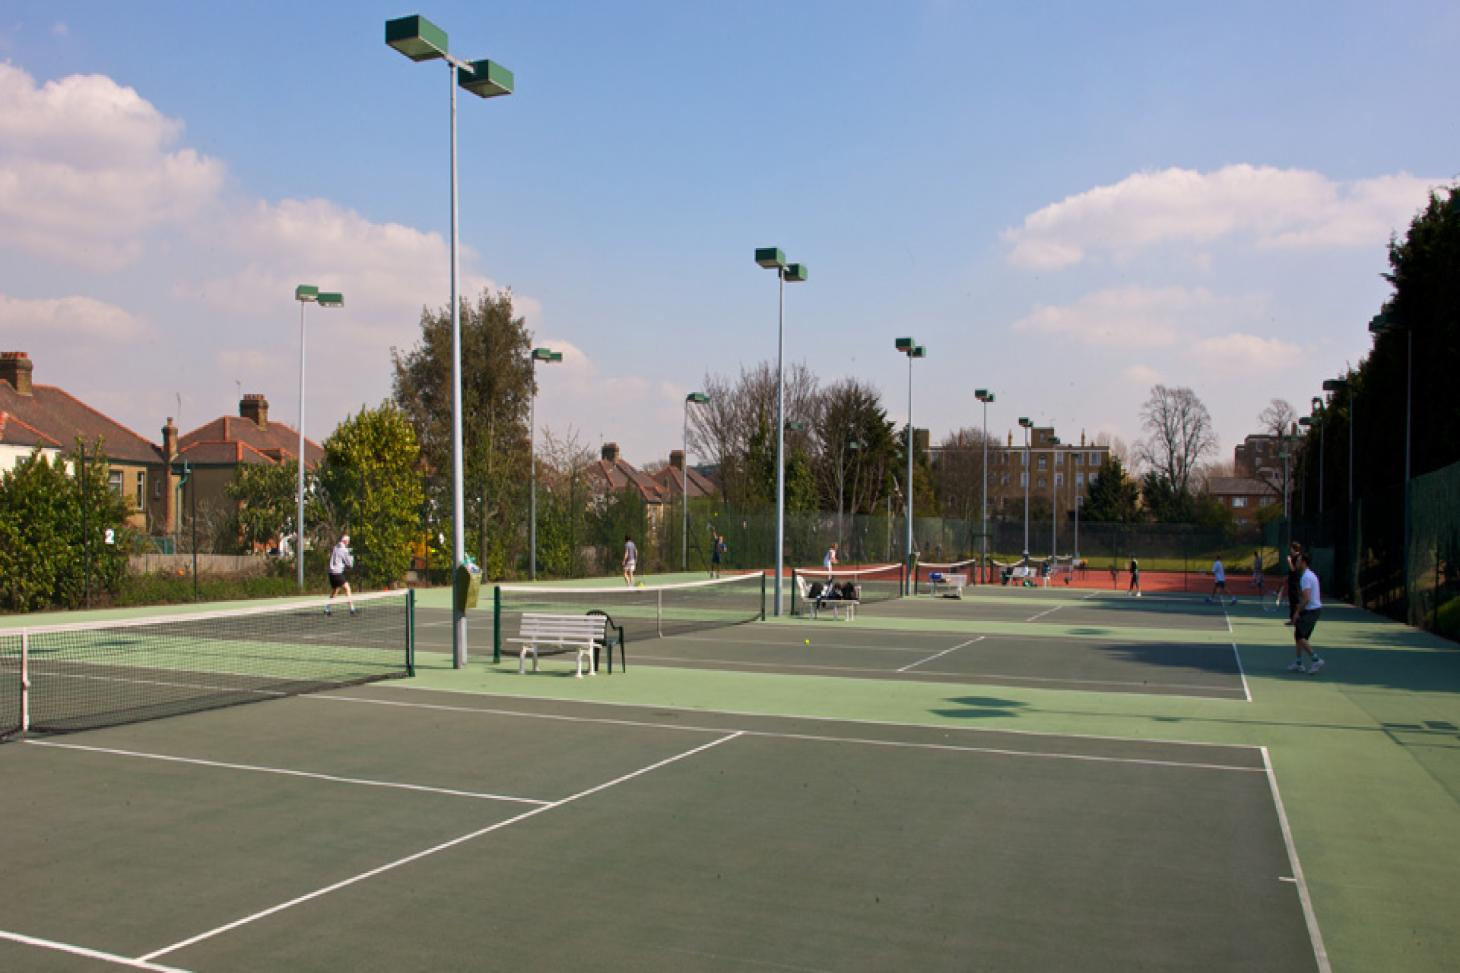 Blackheath Lawn Tennis Club Outdoor | Grass tennis court